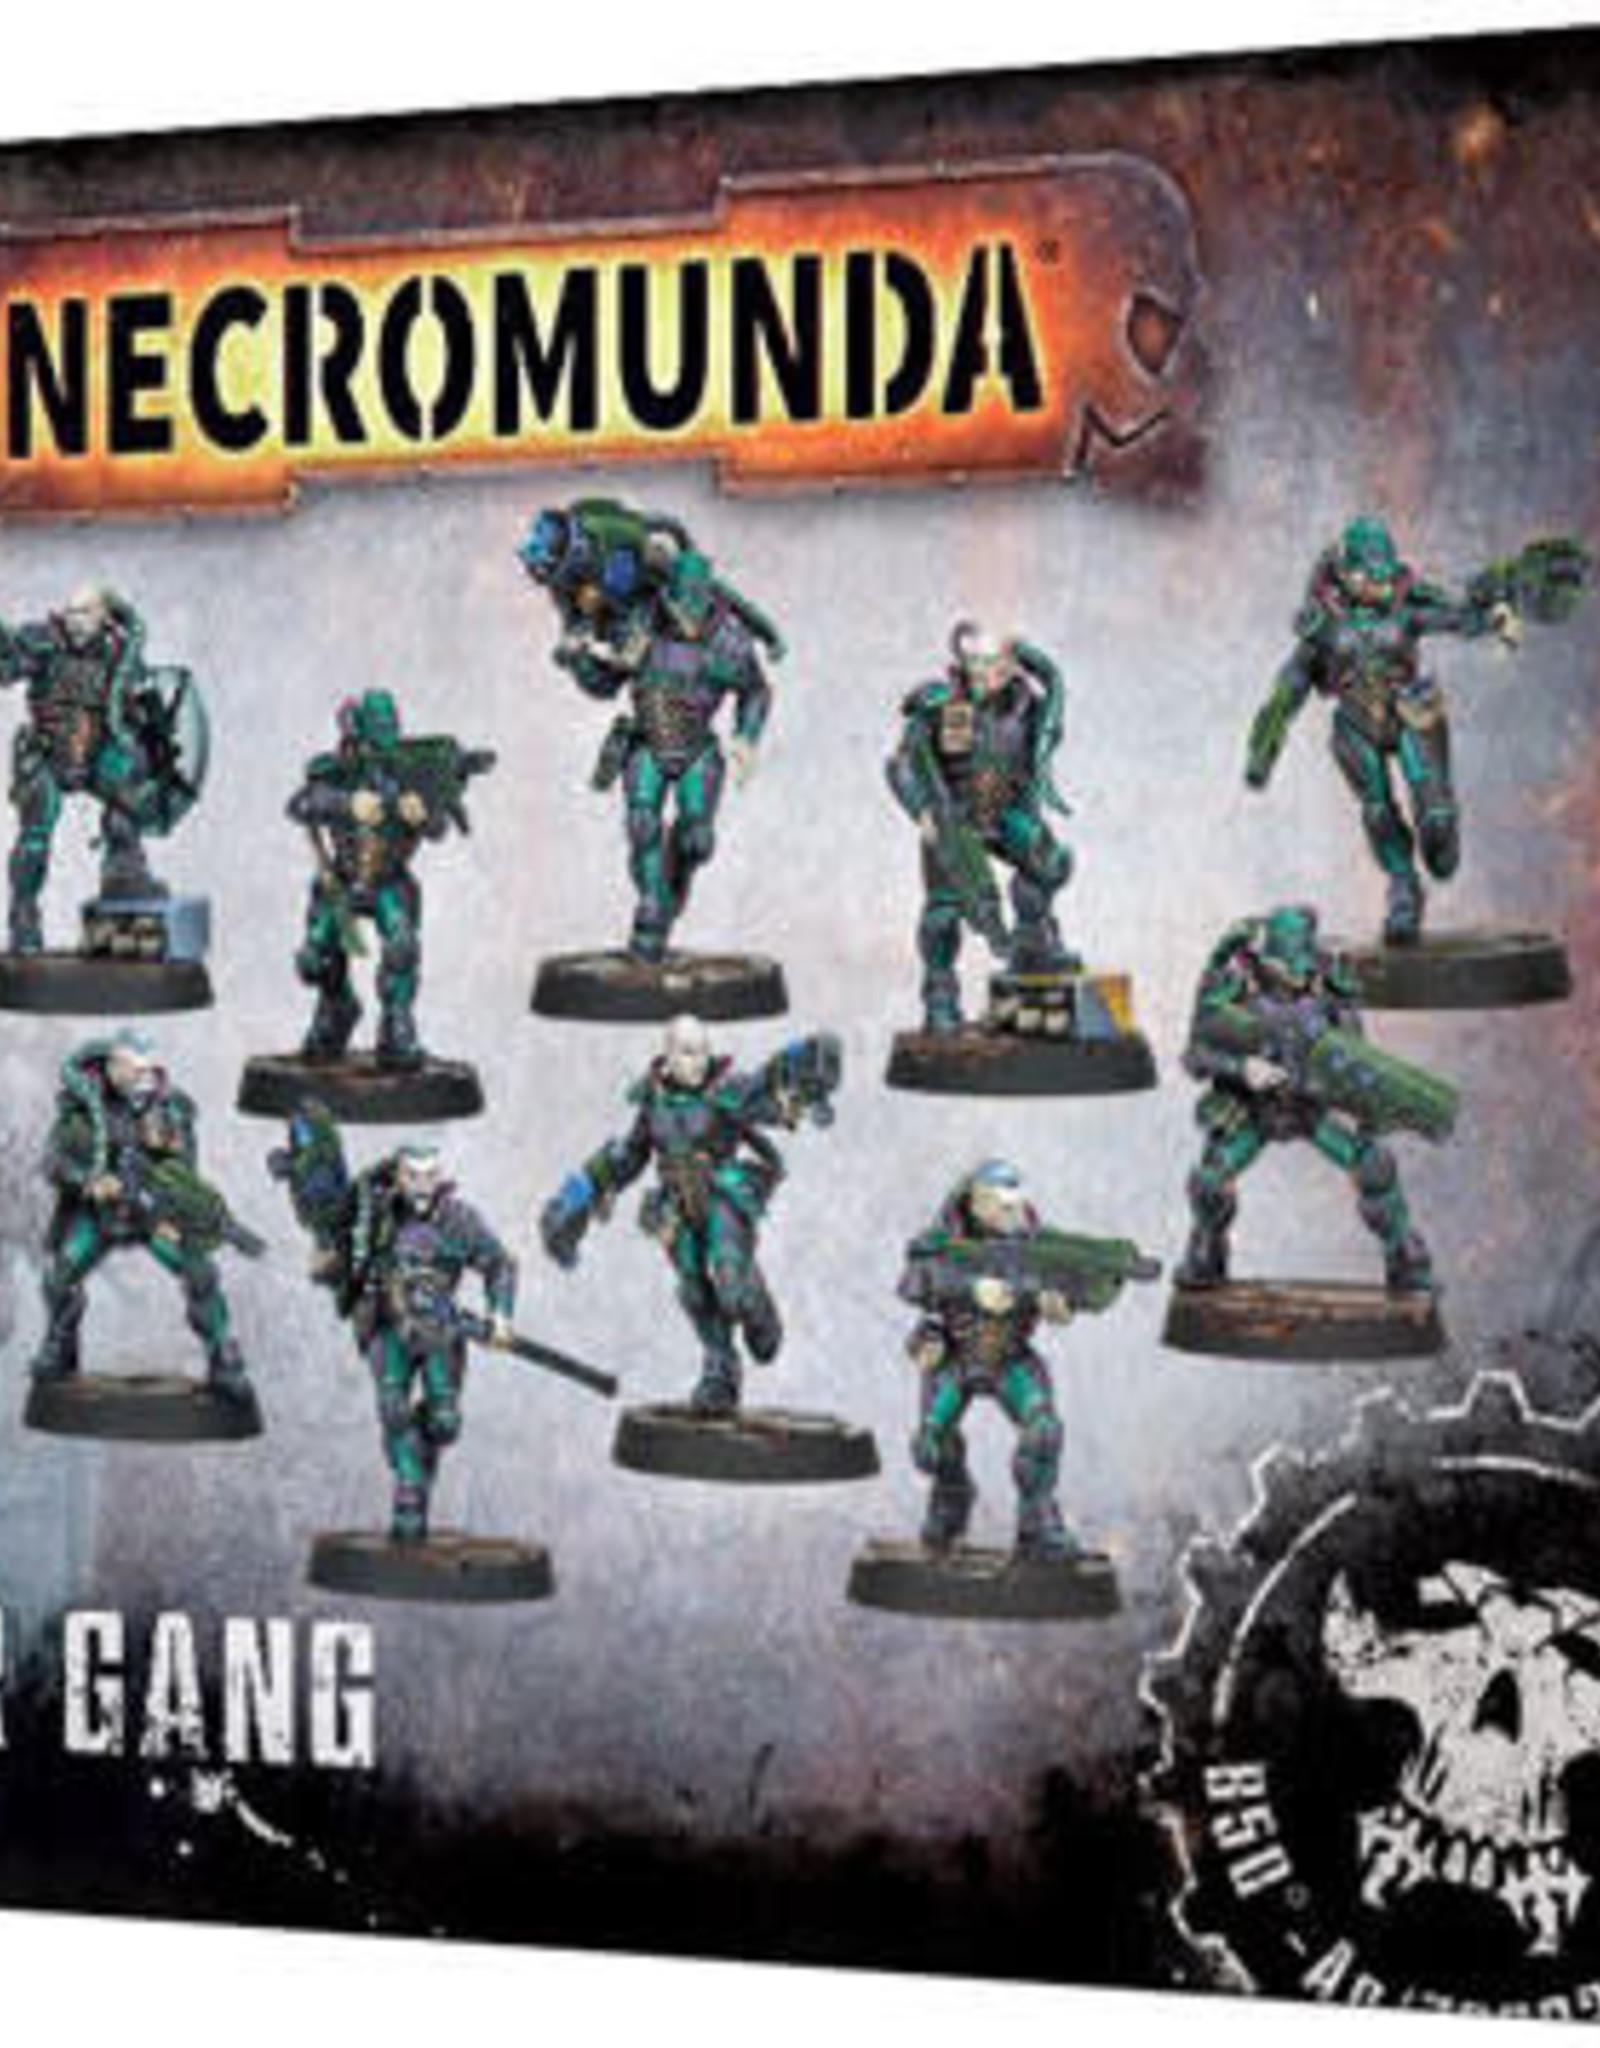 Necromunda Necromunda Van Saar Gang